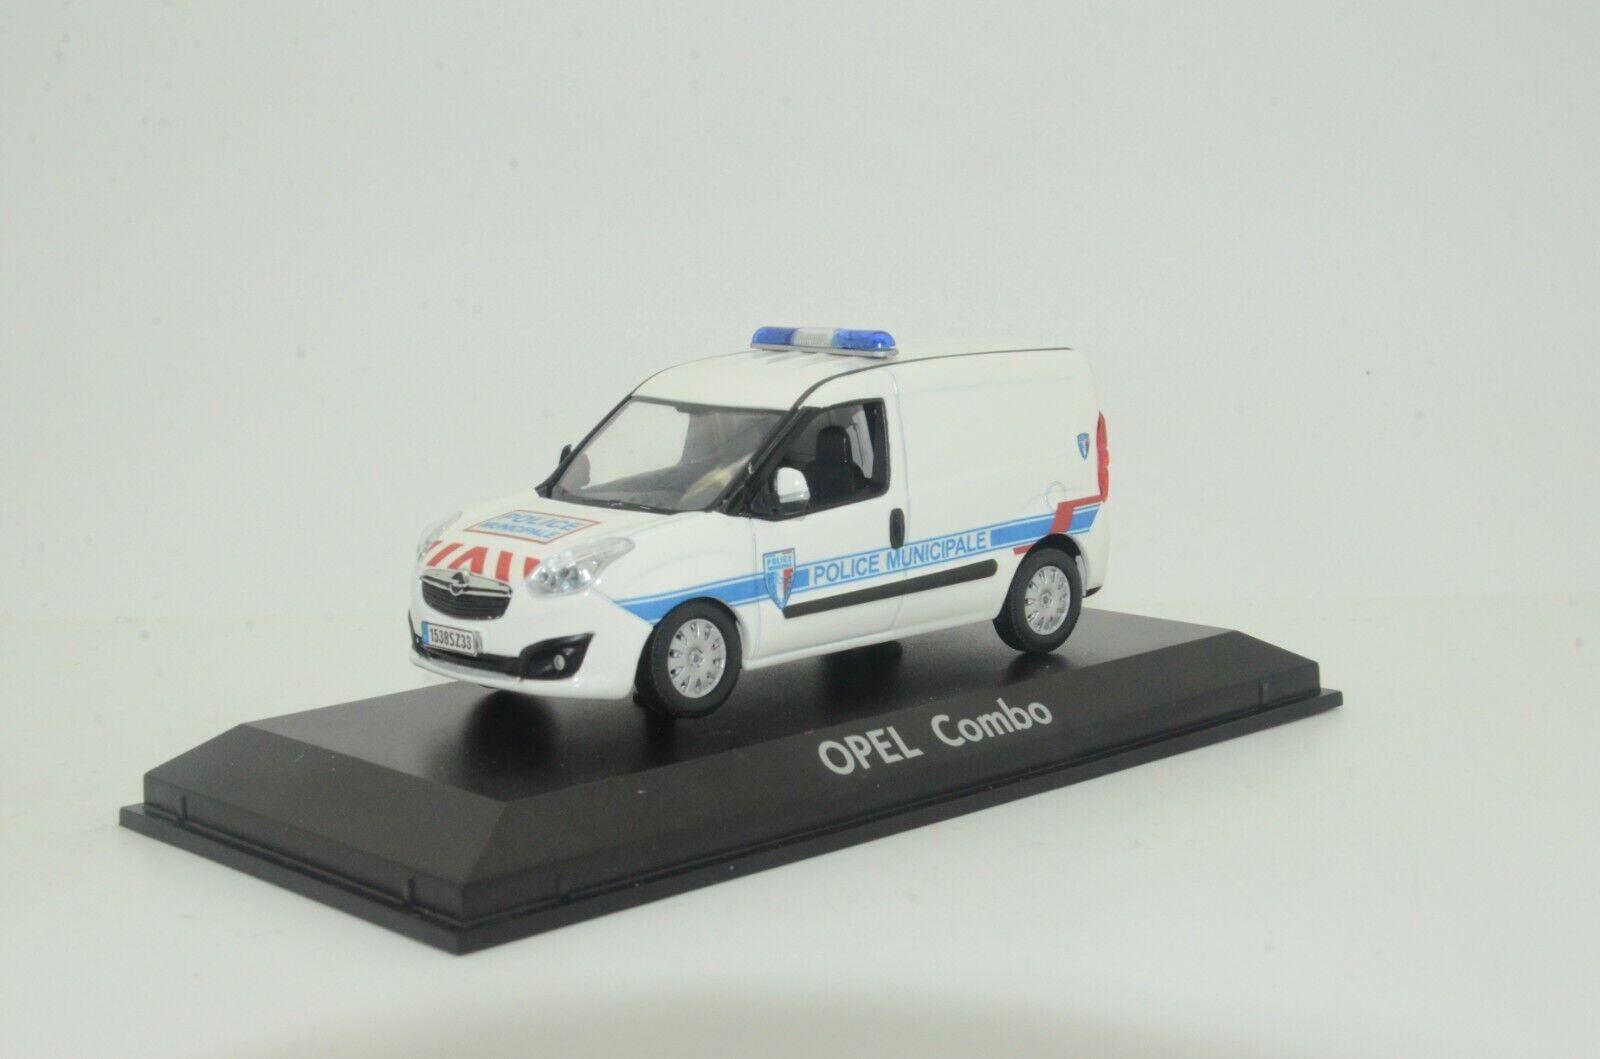 barato      rara    Opel Combo Francia policía emitida Hecho a Medida 1 43  alta calidad